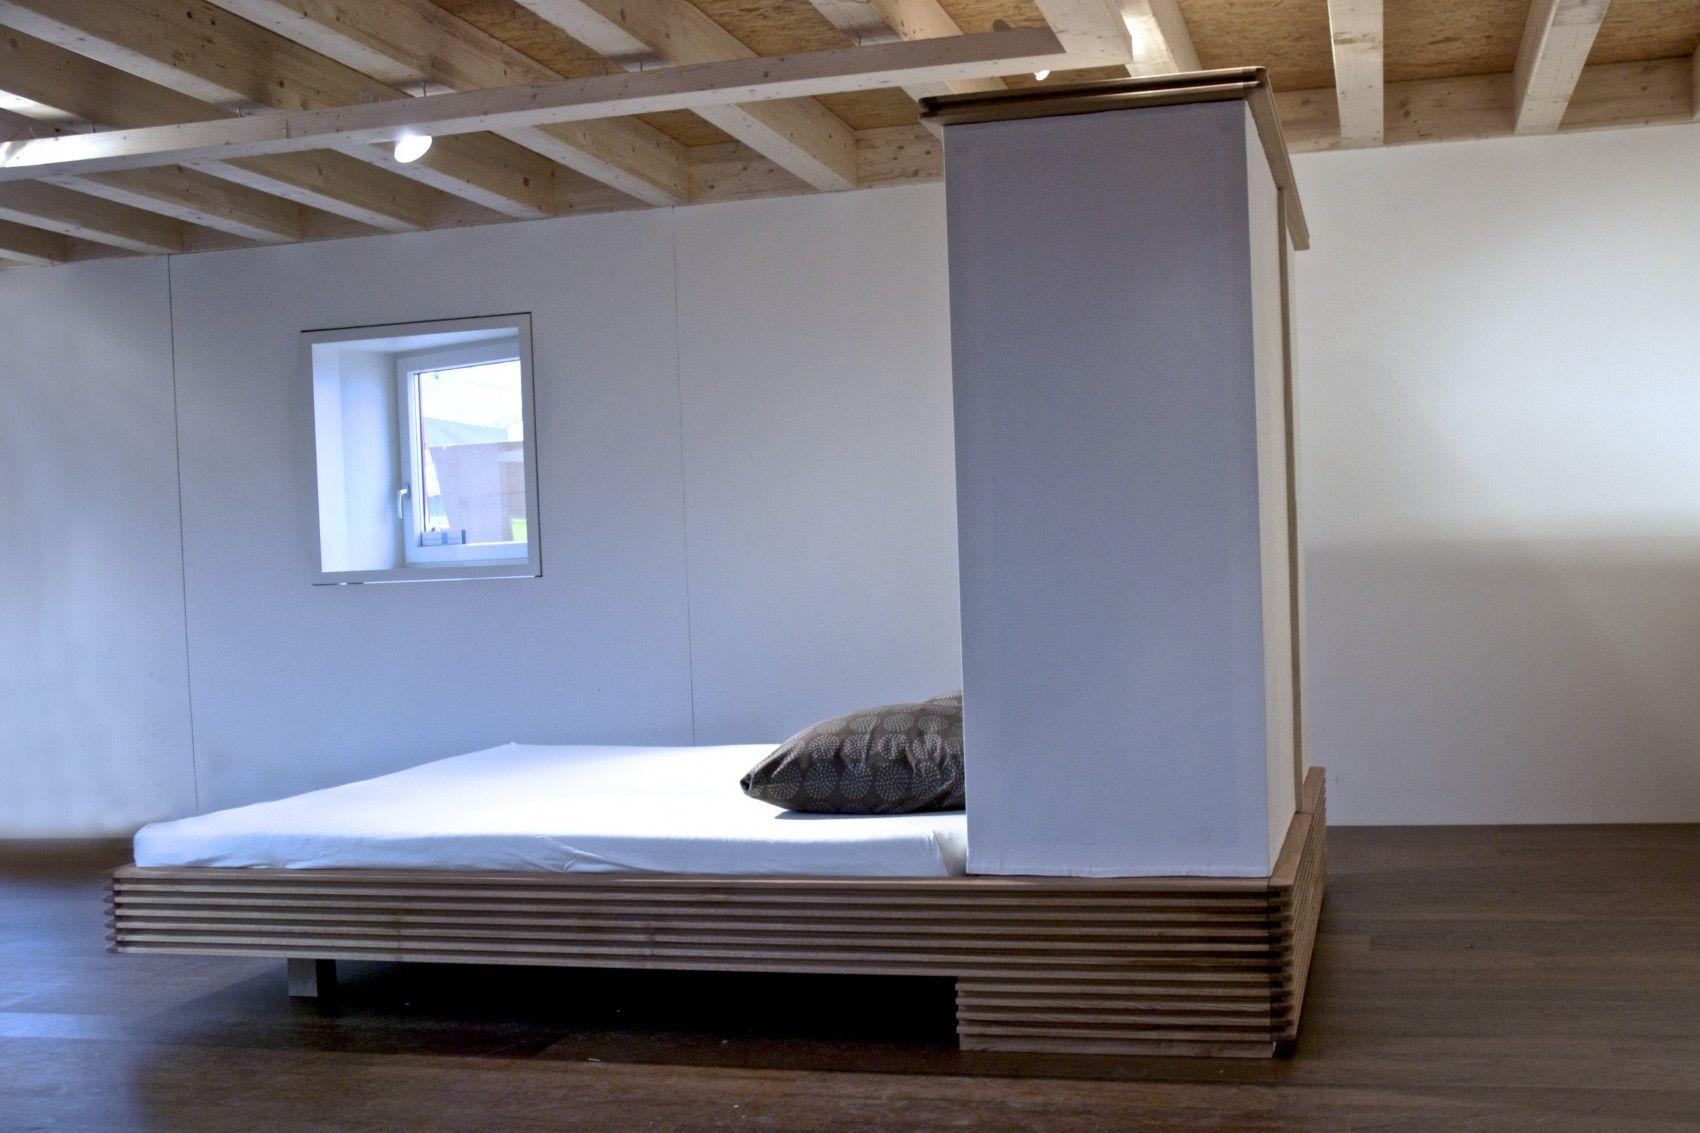 Full Size of Bett Schrank 160x200 Schrankbett 180x200 Ikea Apartment Schrankwand Sofa Kombination Jugendzimmer Schreibtisch Und Frisch Betten 140x200 Weiß Kingsize Bett Bett Schrank